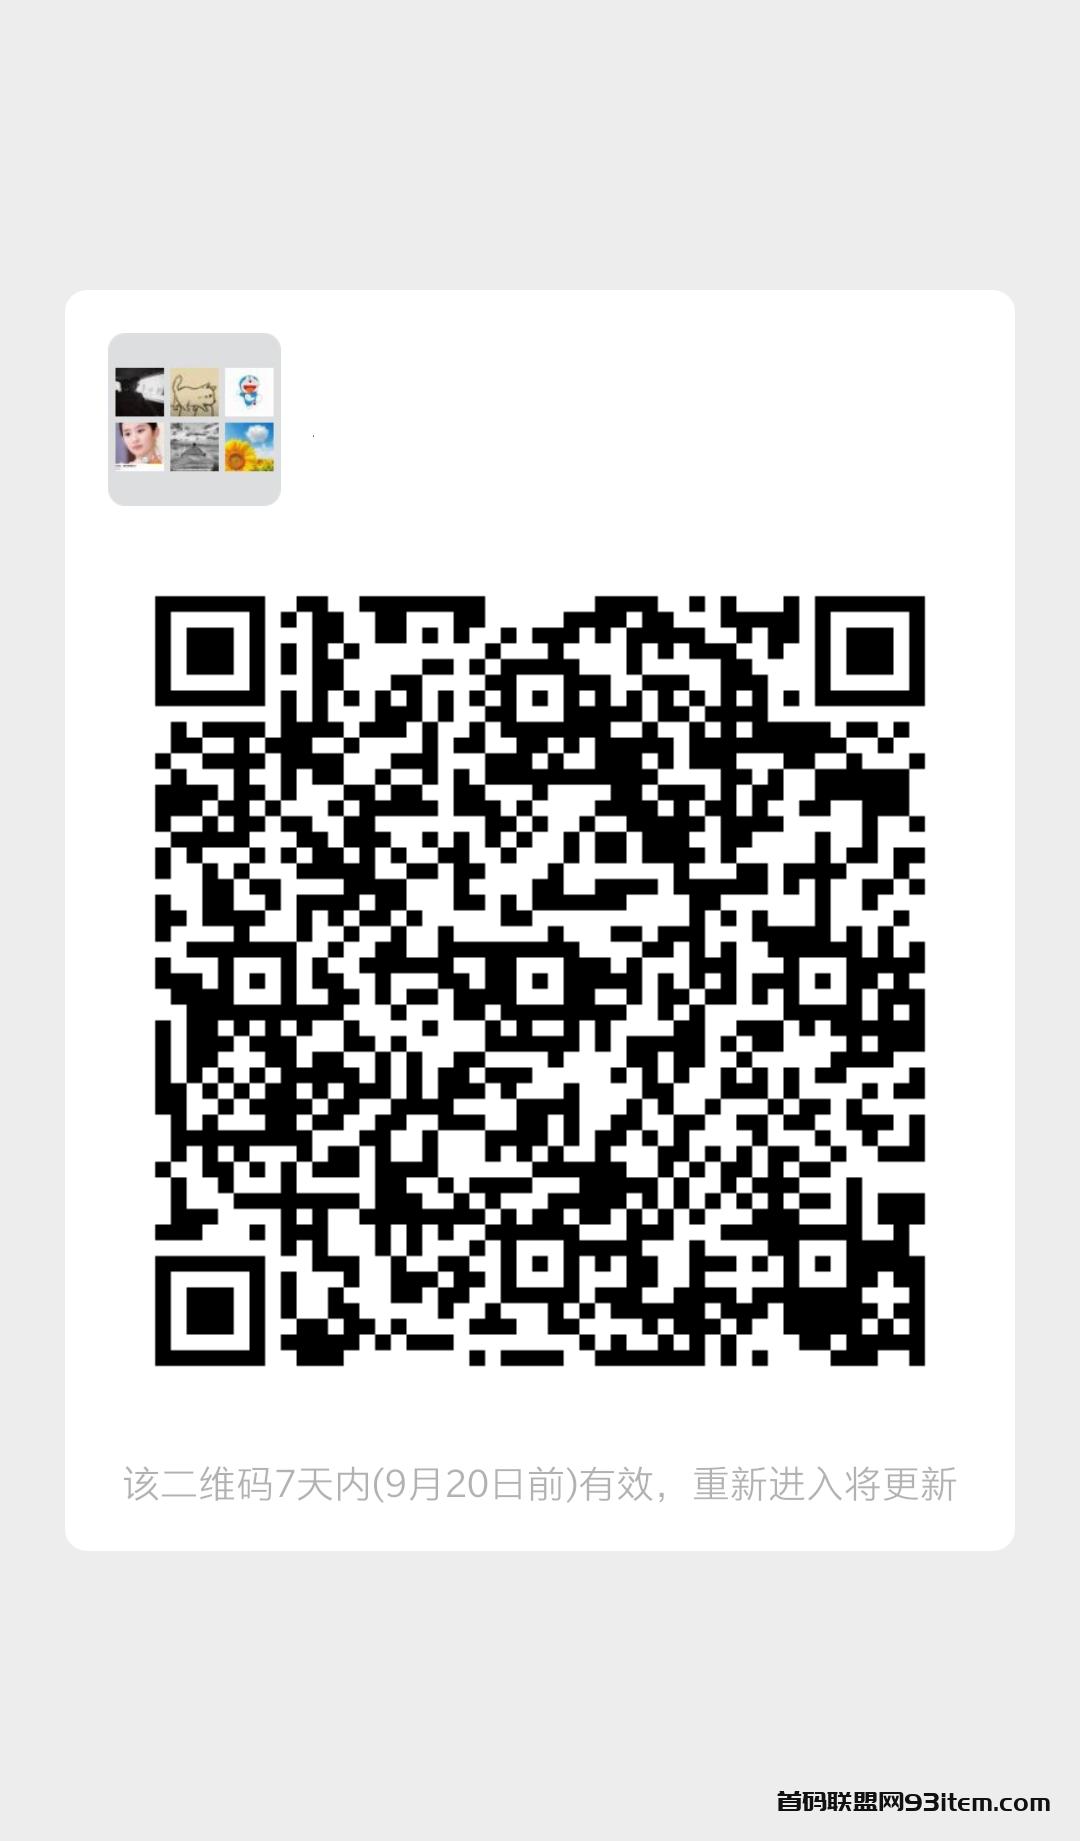 mmqrcode1599999951455__01